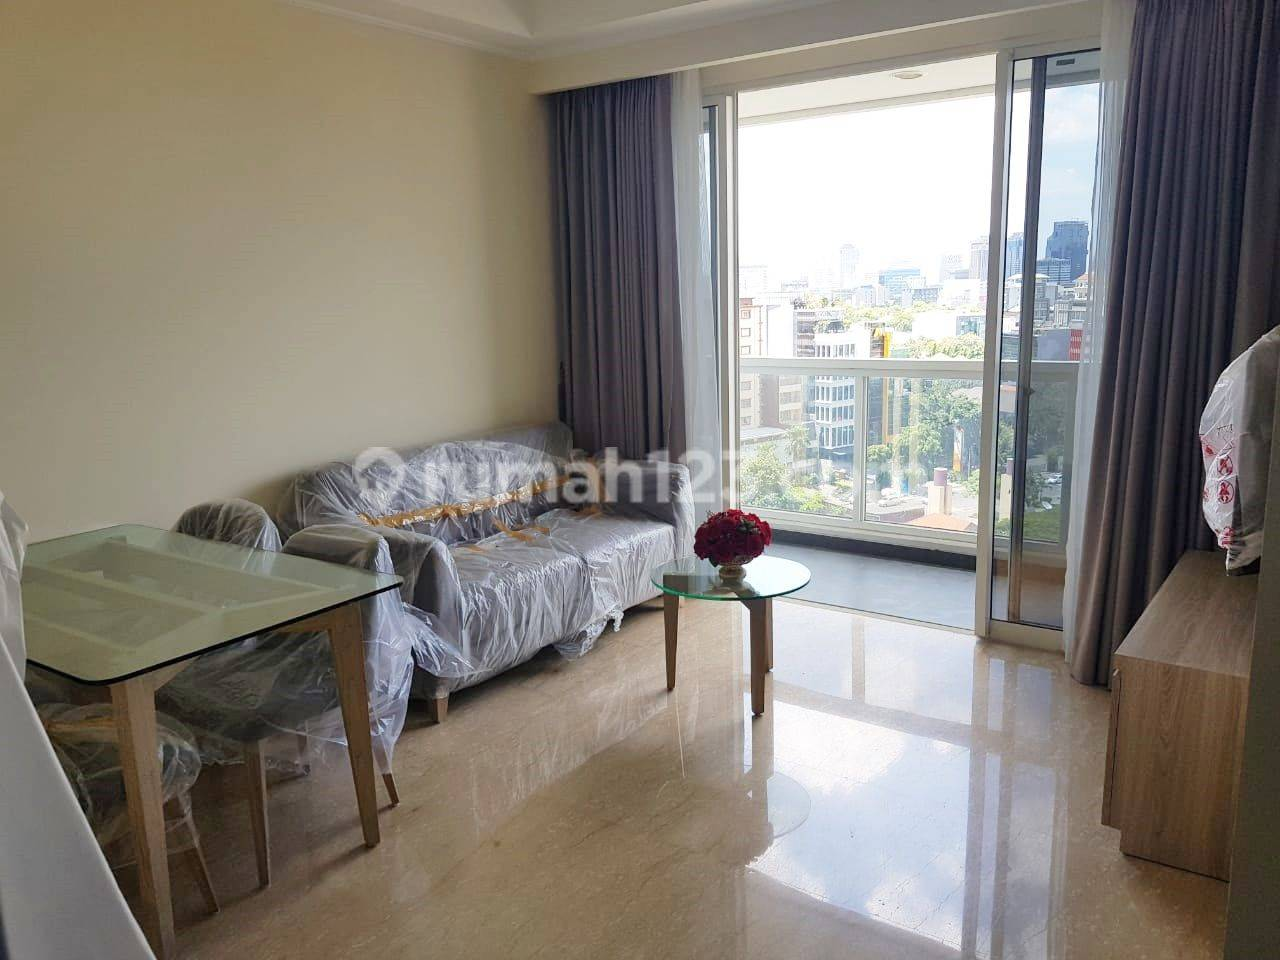 Apartemen Menteng Park, Jakarta Pusat Fully Furnished dan Semi Private Lift